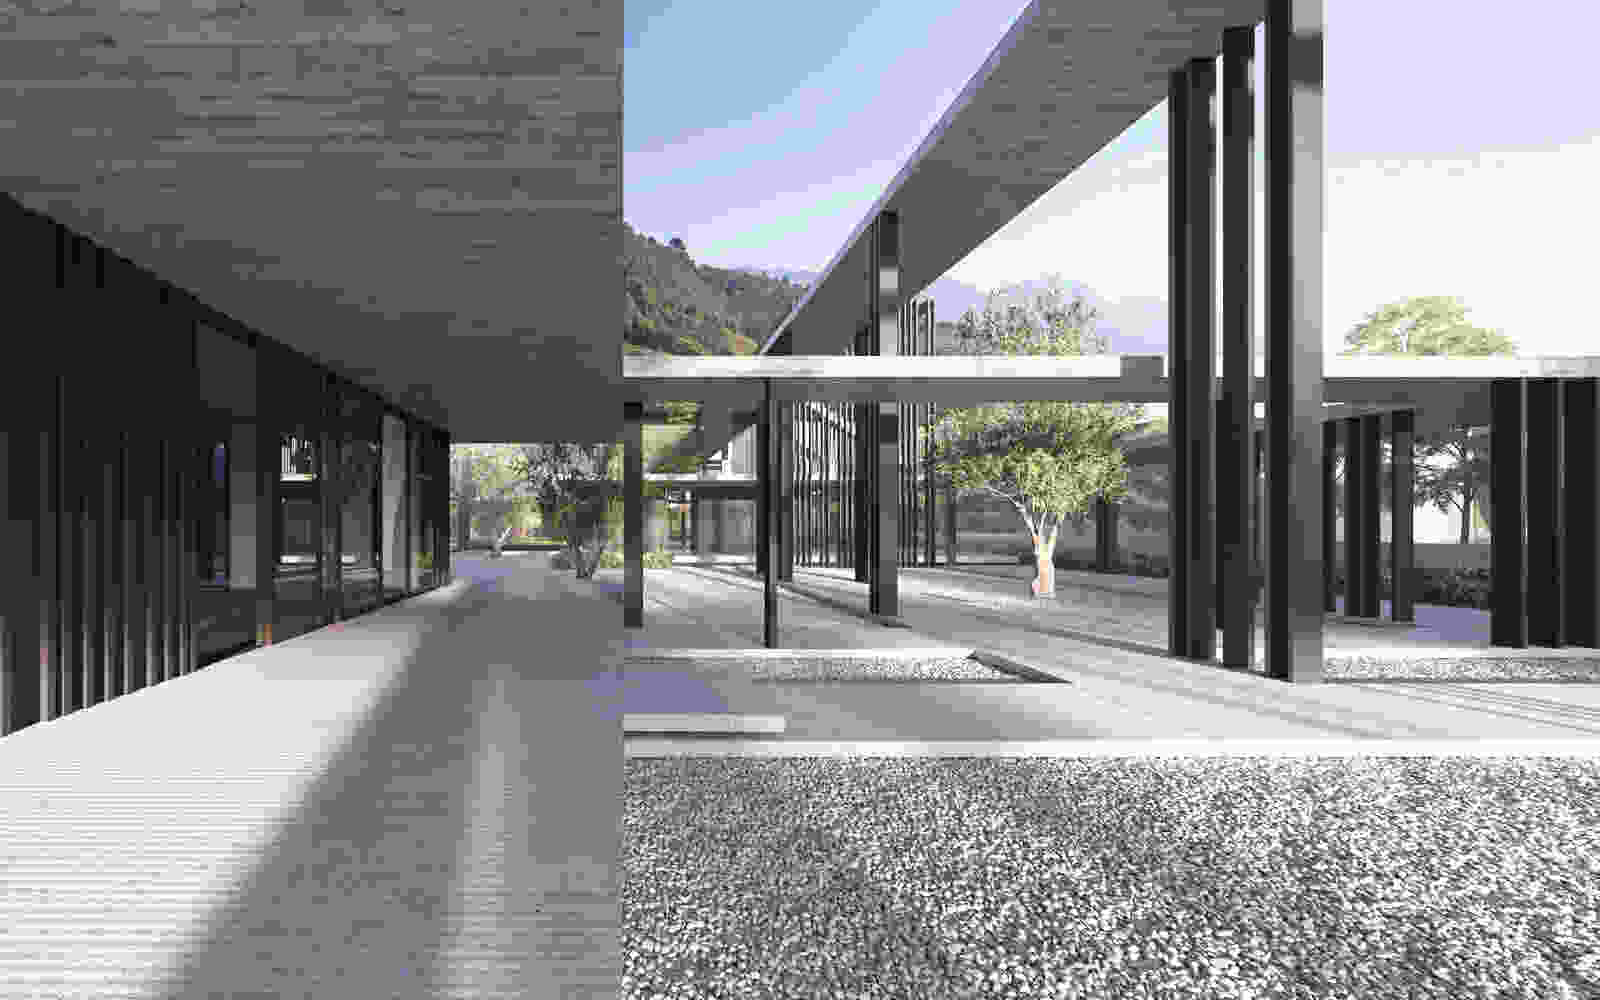 397 ANTONIANUM meran courtyard dm vis 002 concrete